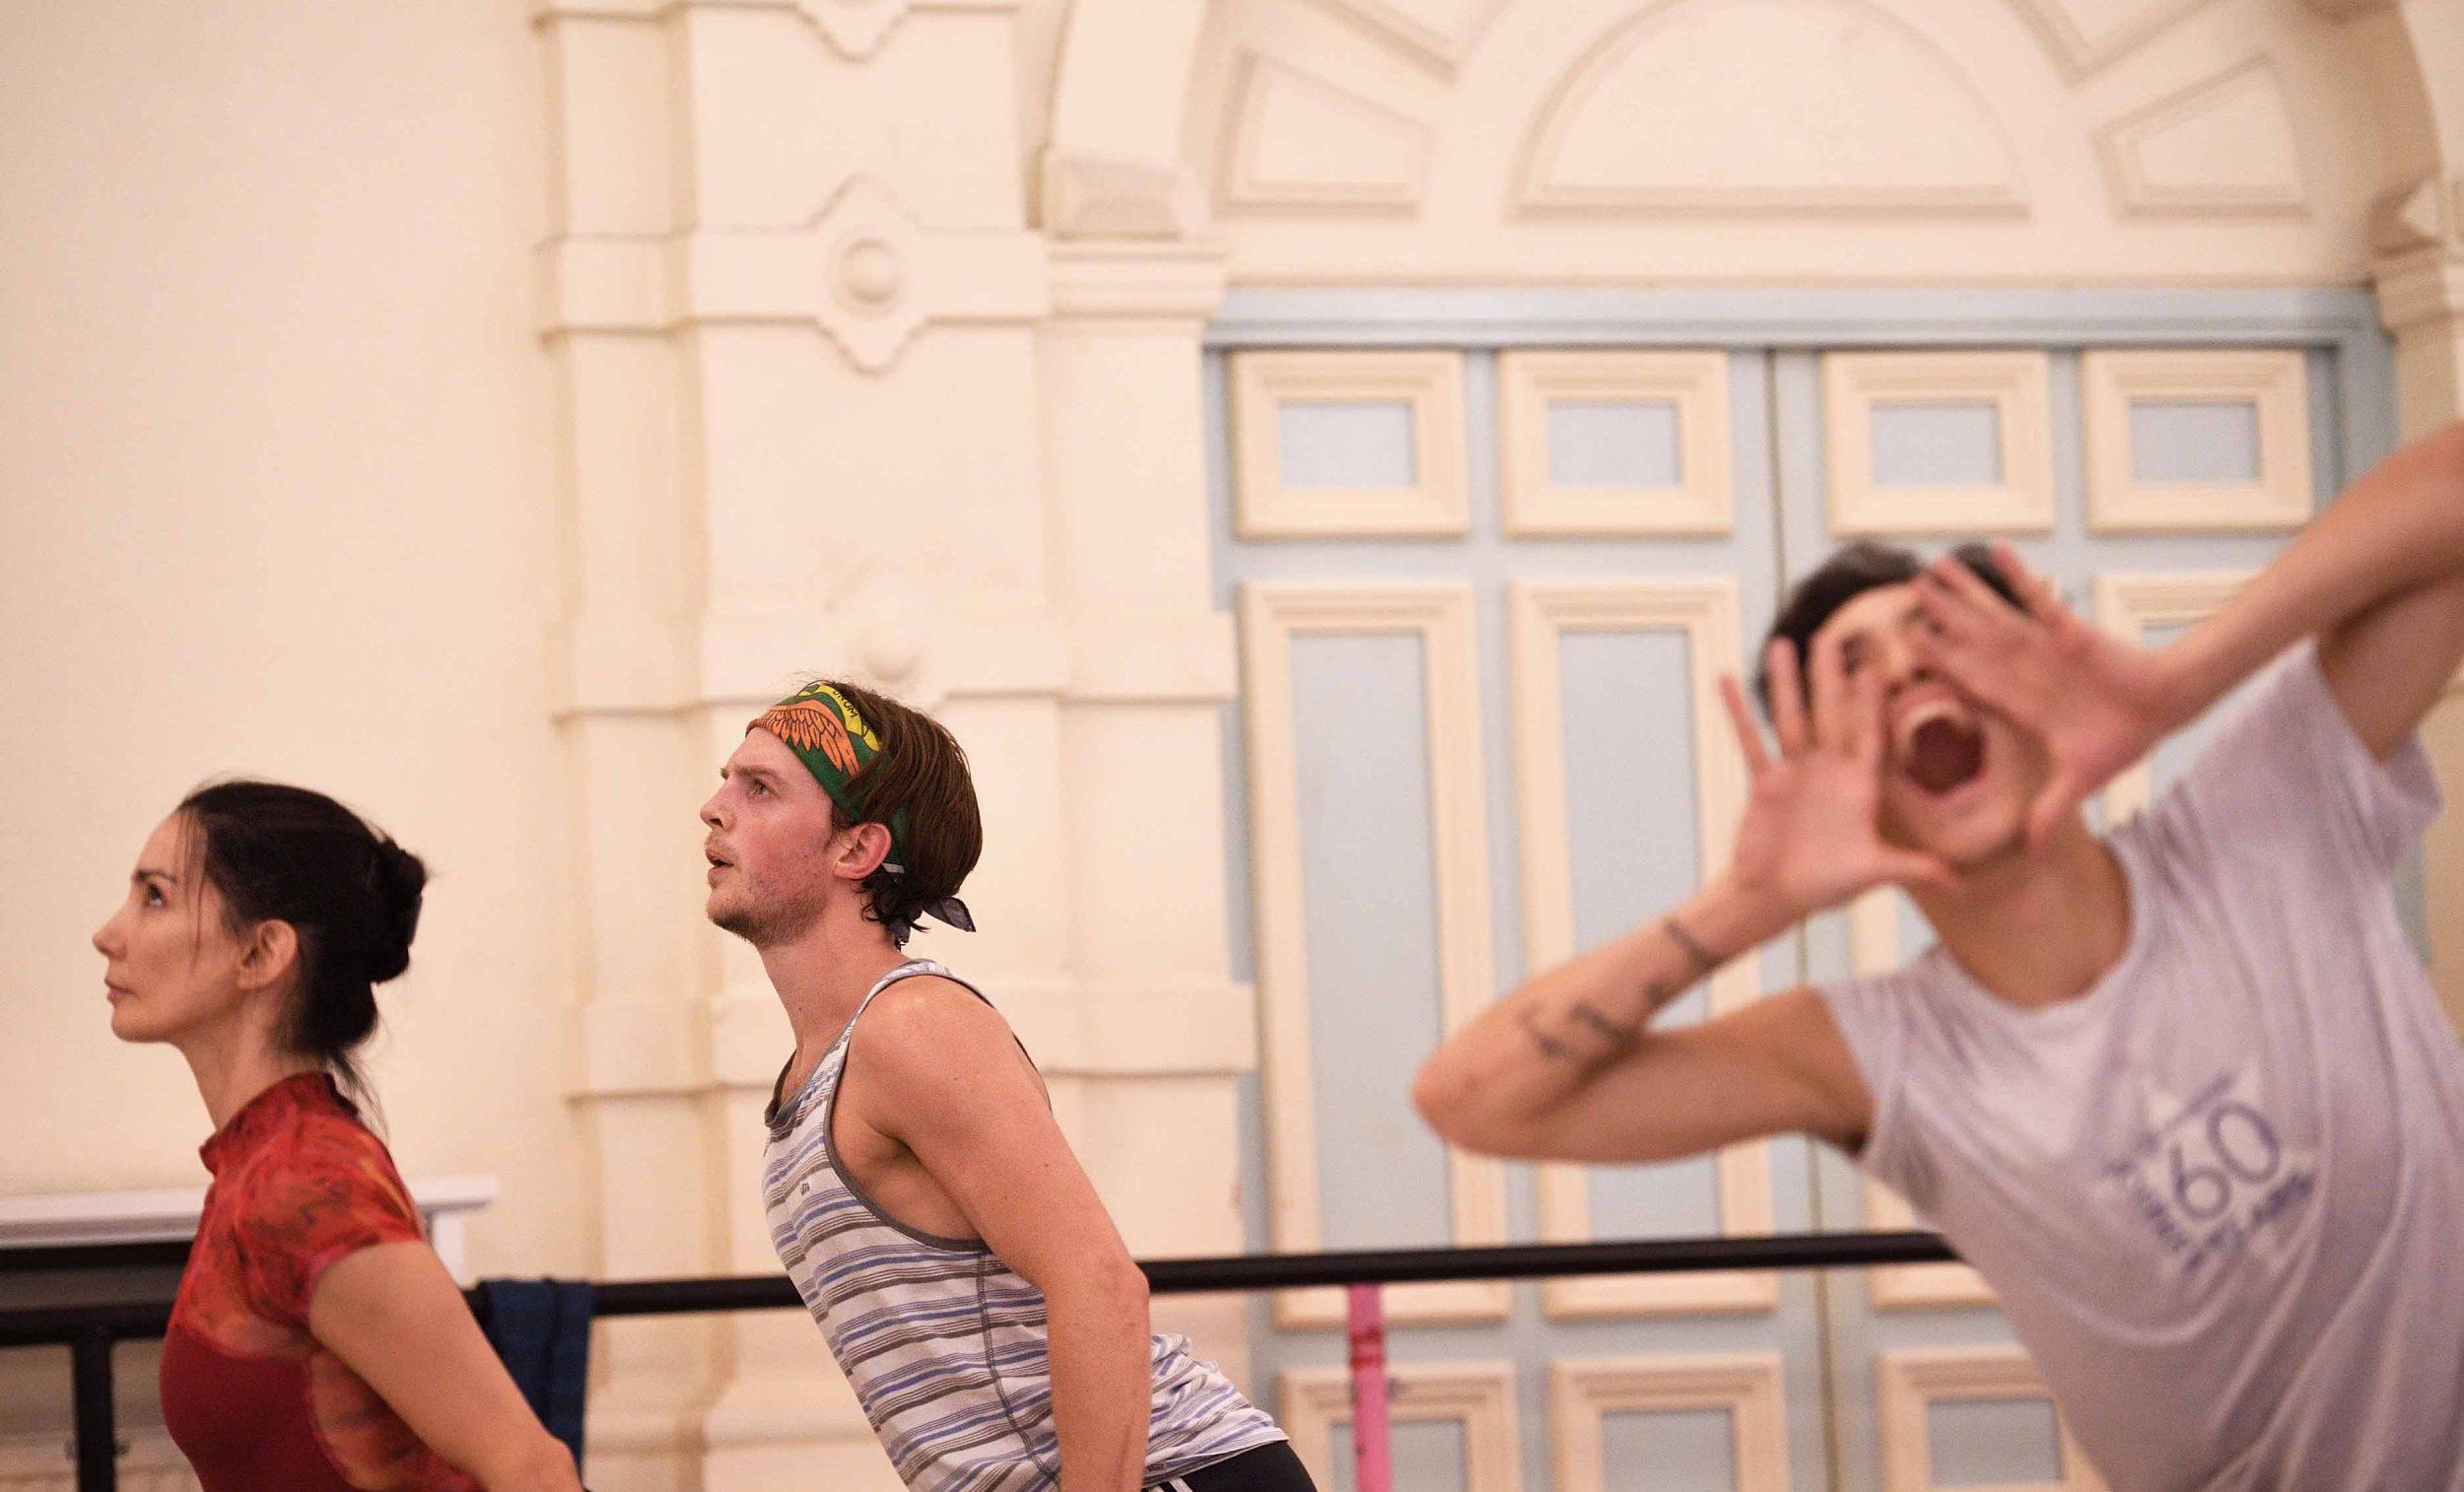 Tamara-Rojo,-Joseph-Caley,-and-Jeffrey-Cirio-rehearsing-Song-of-the-Earth-©-Laurent-Liotardo